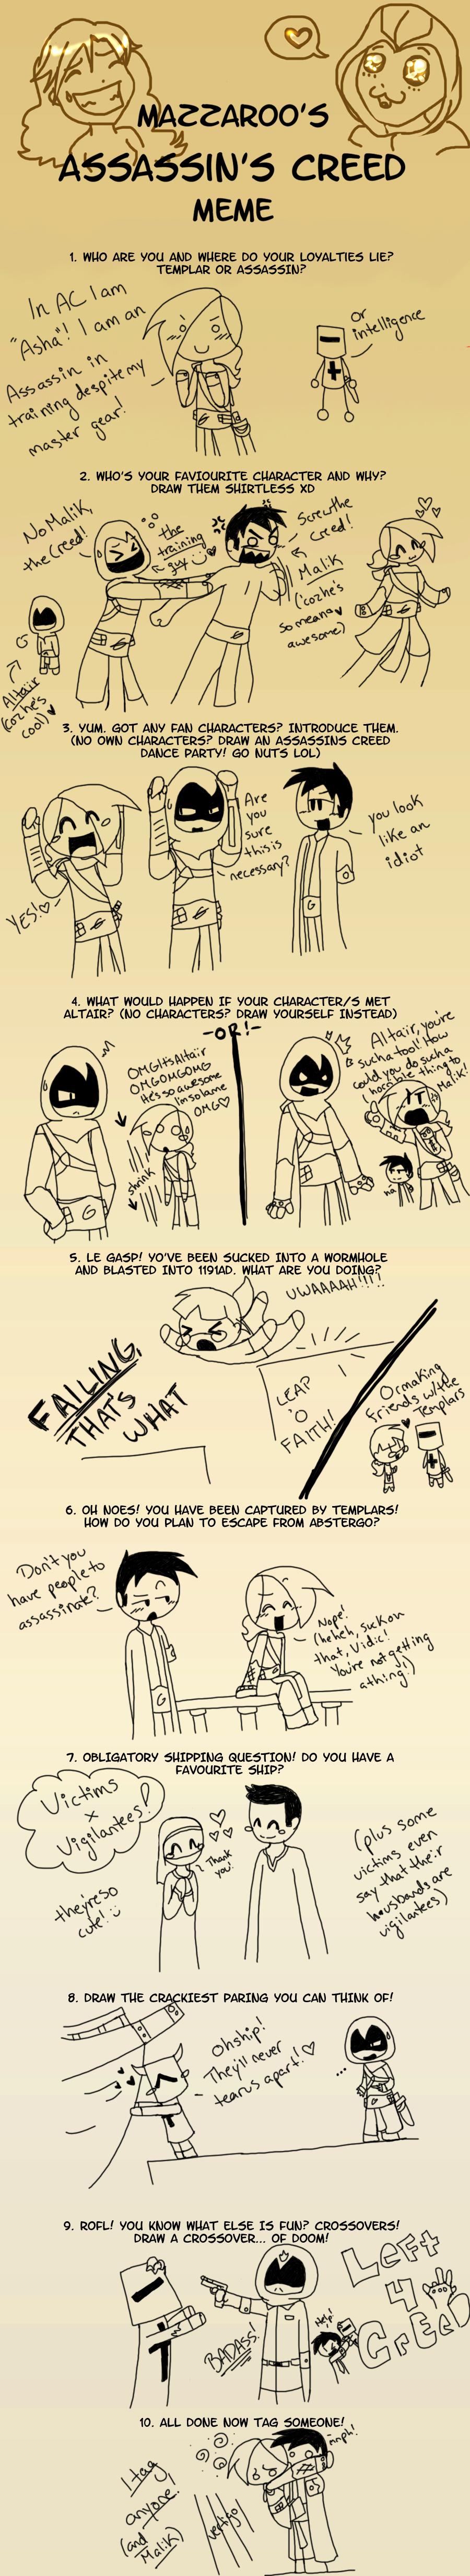 Maz's Assassin Creed Meme by explodingcrayon93